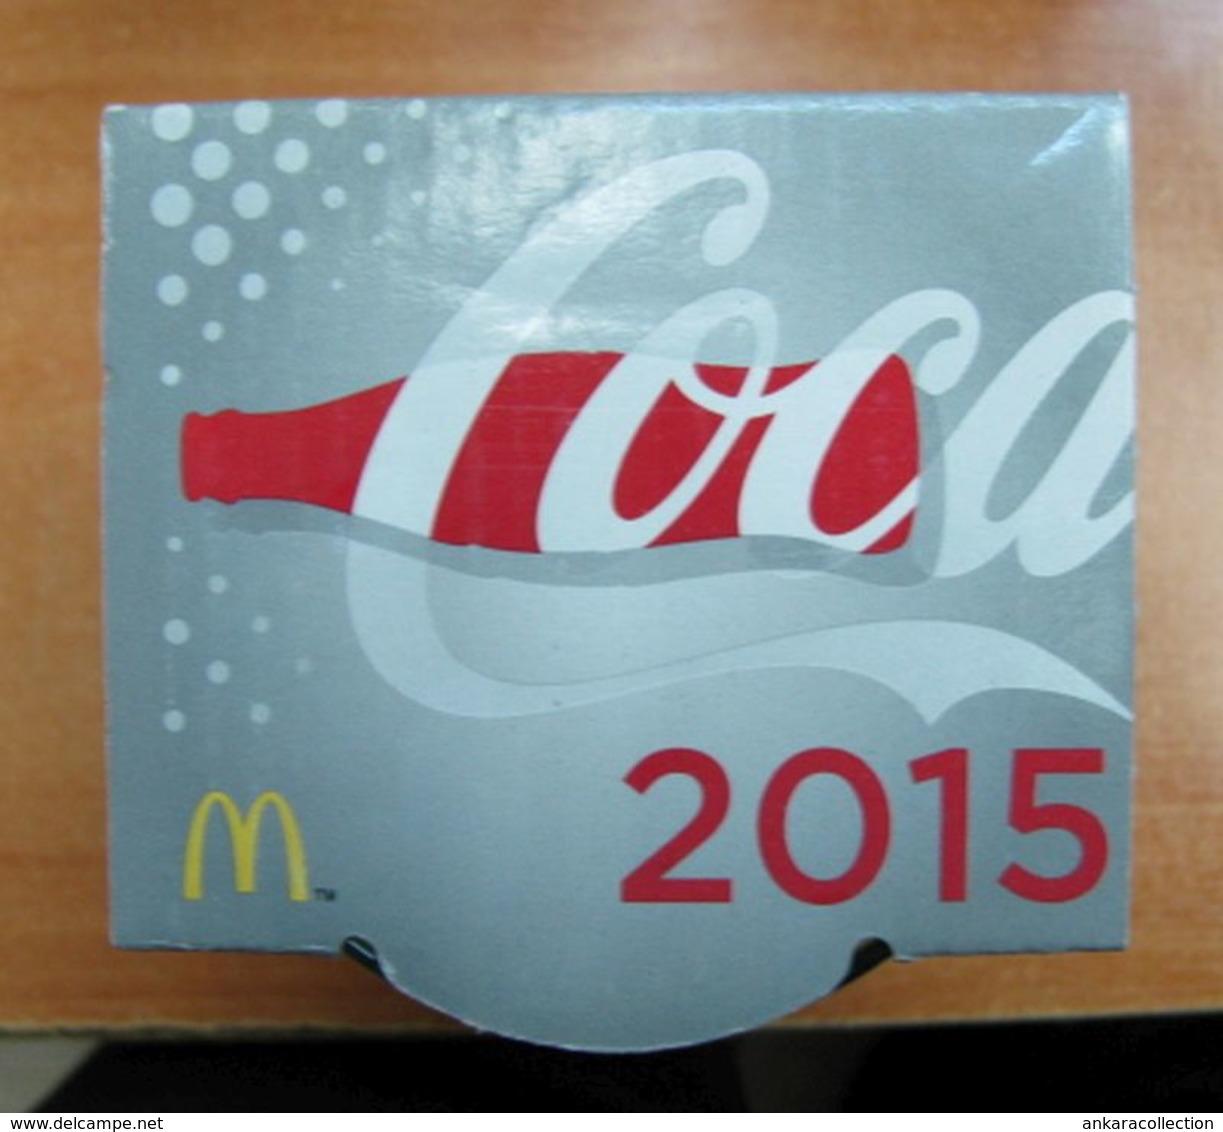 AC - COCA COLA McDONALD'S 2015 GREENISH CLEAR GLASS IN ITS ORIGINAL BOX - Tazas & Vasos